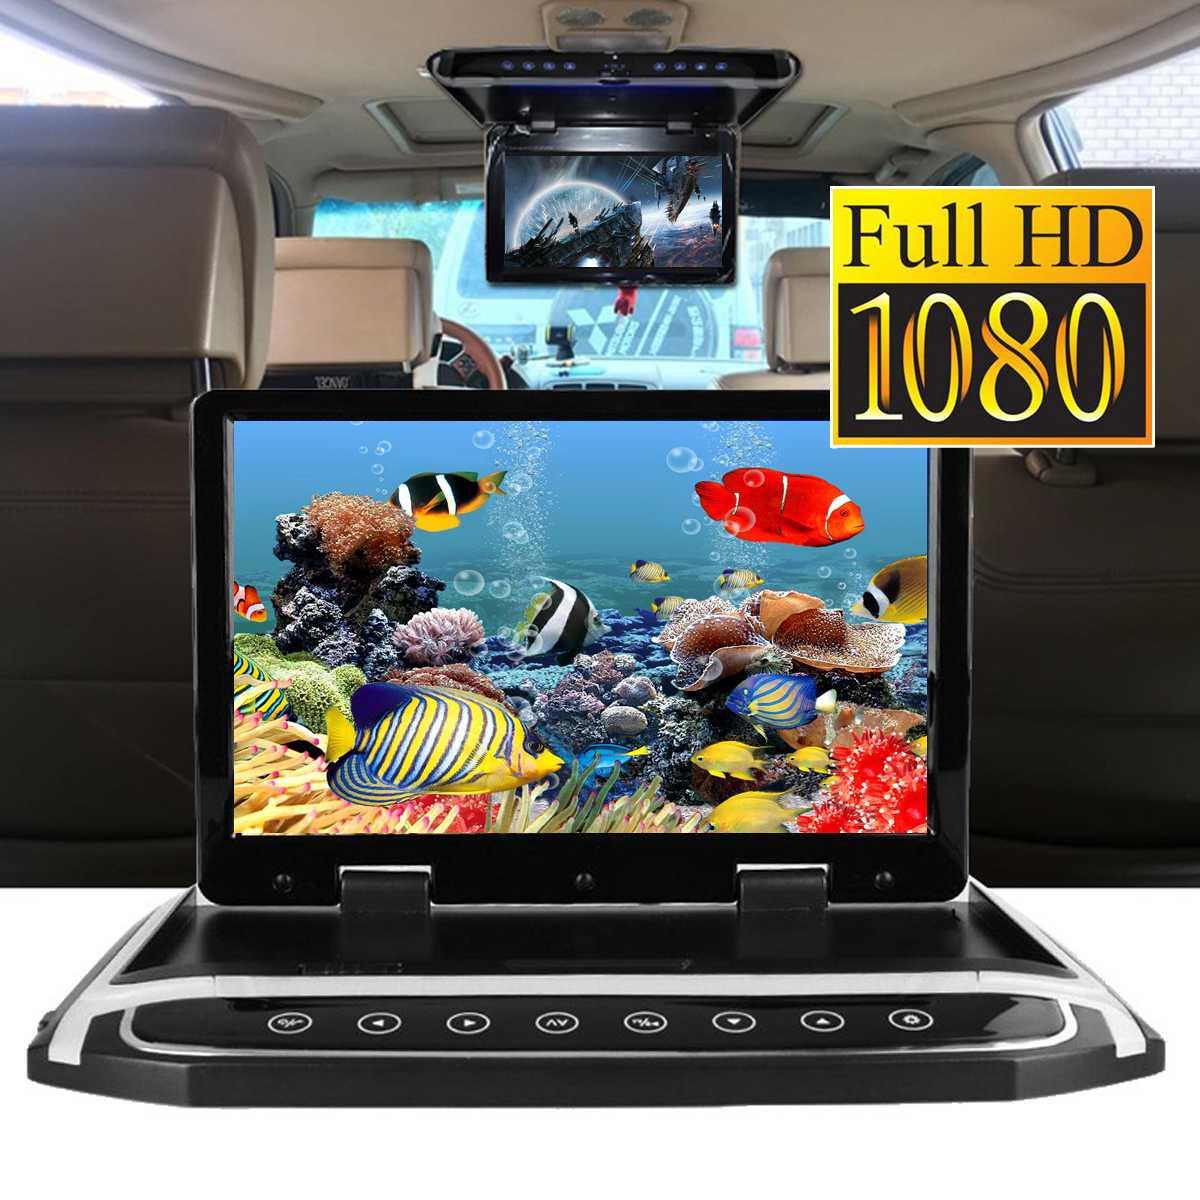 15.6 hd tela larga carro dvd player hdmi teto do carro flip down monitor telhado montagem jogador 1920*1080 - 6